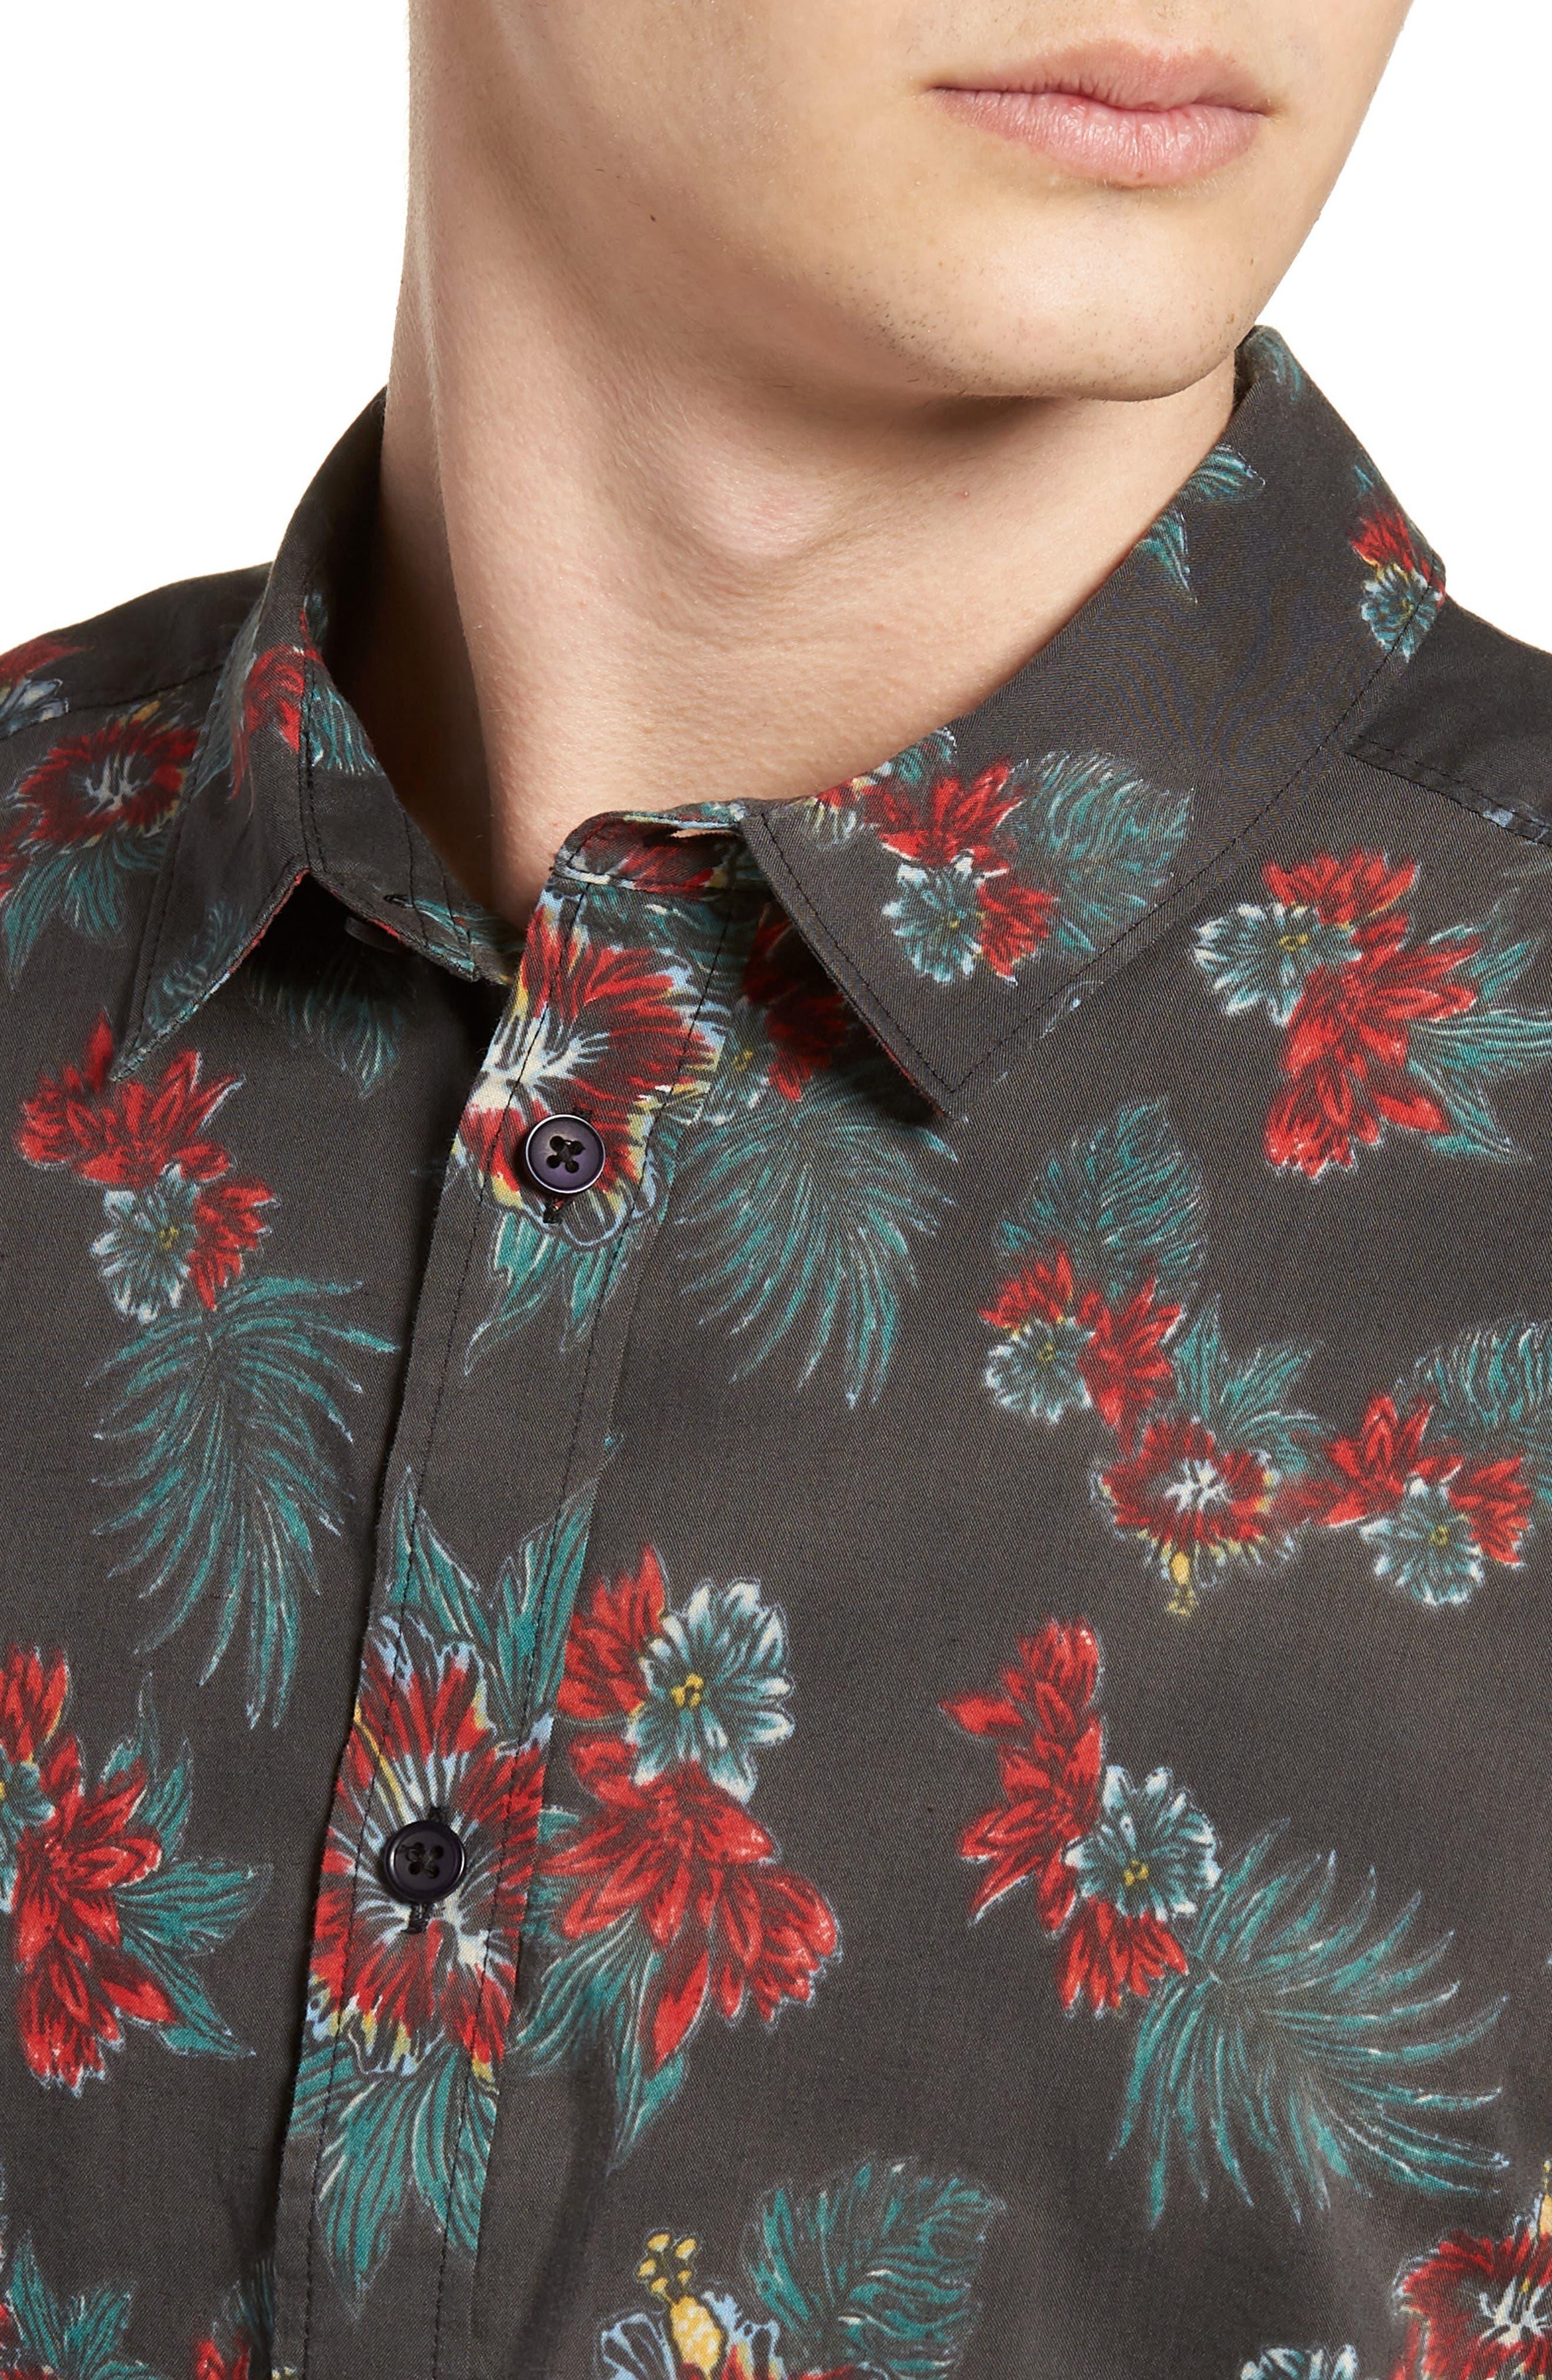 McMillan Floral Woven Shirt,                             Alternate thumbnail 4, color,                             001